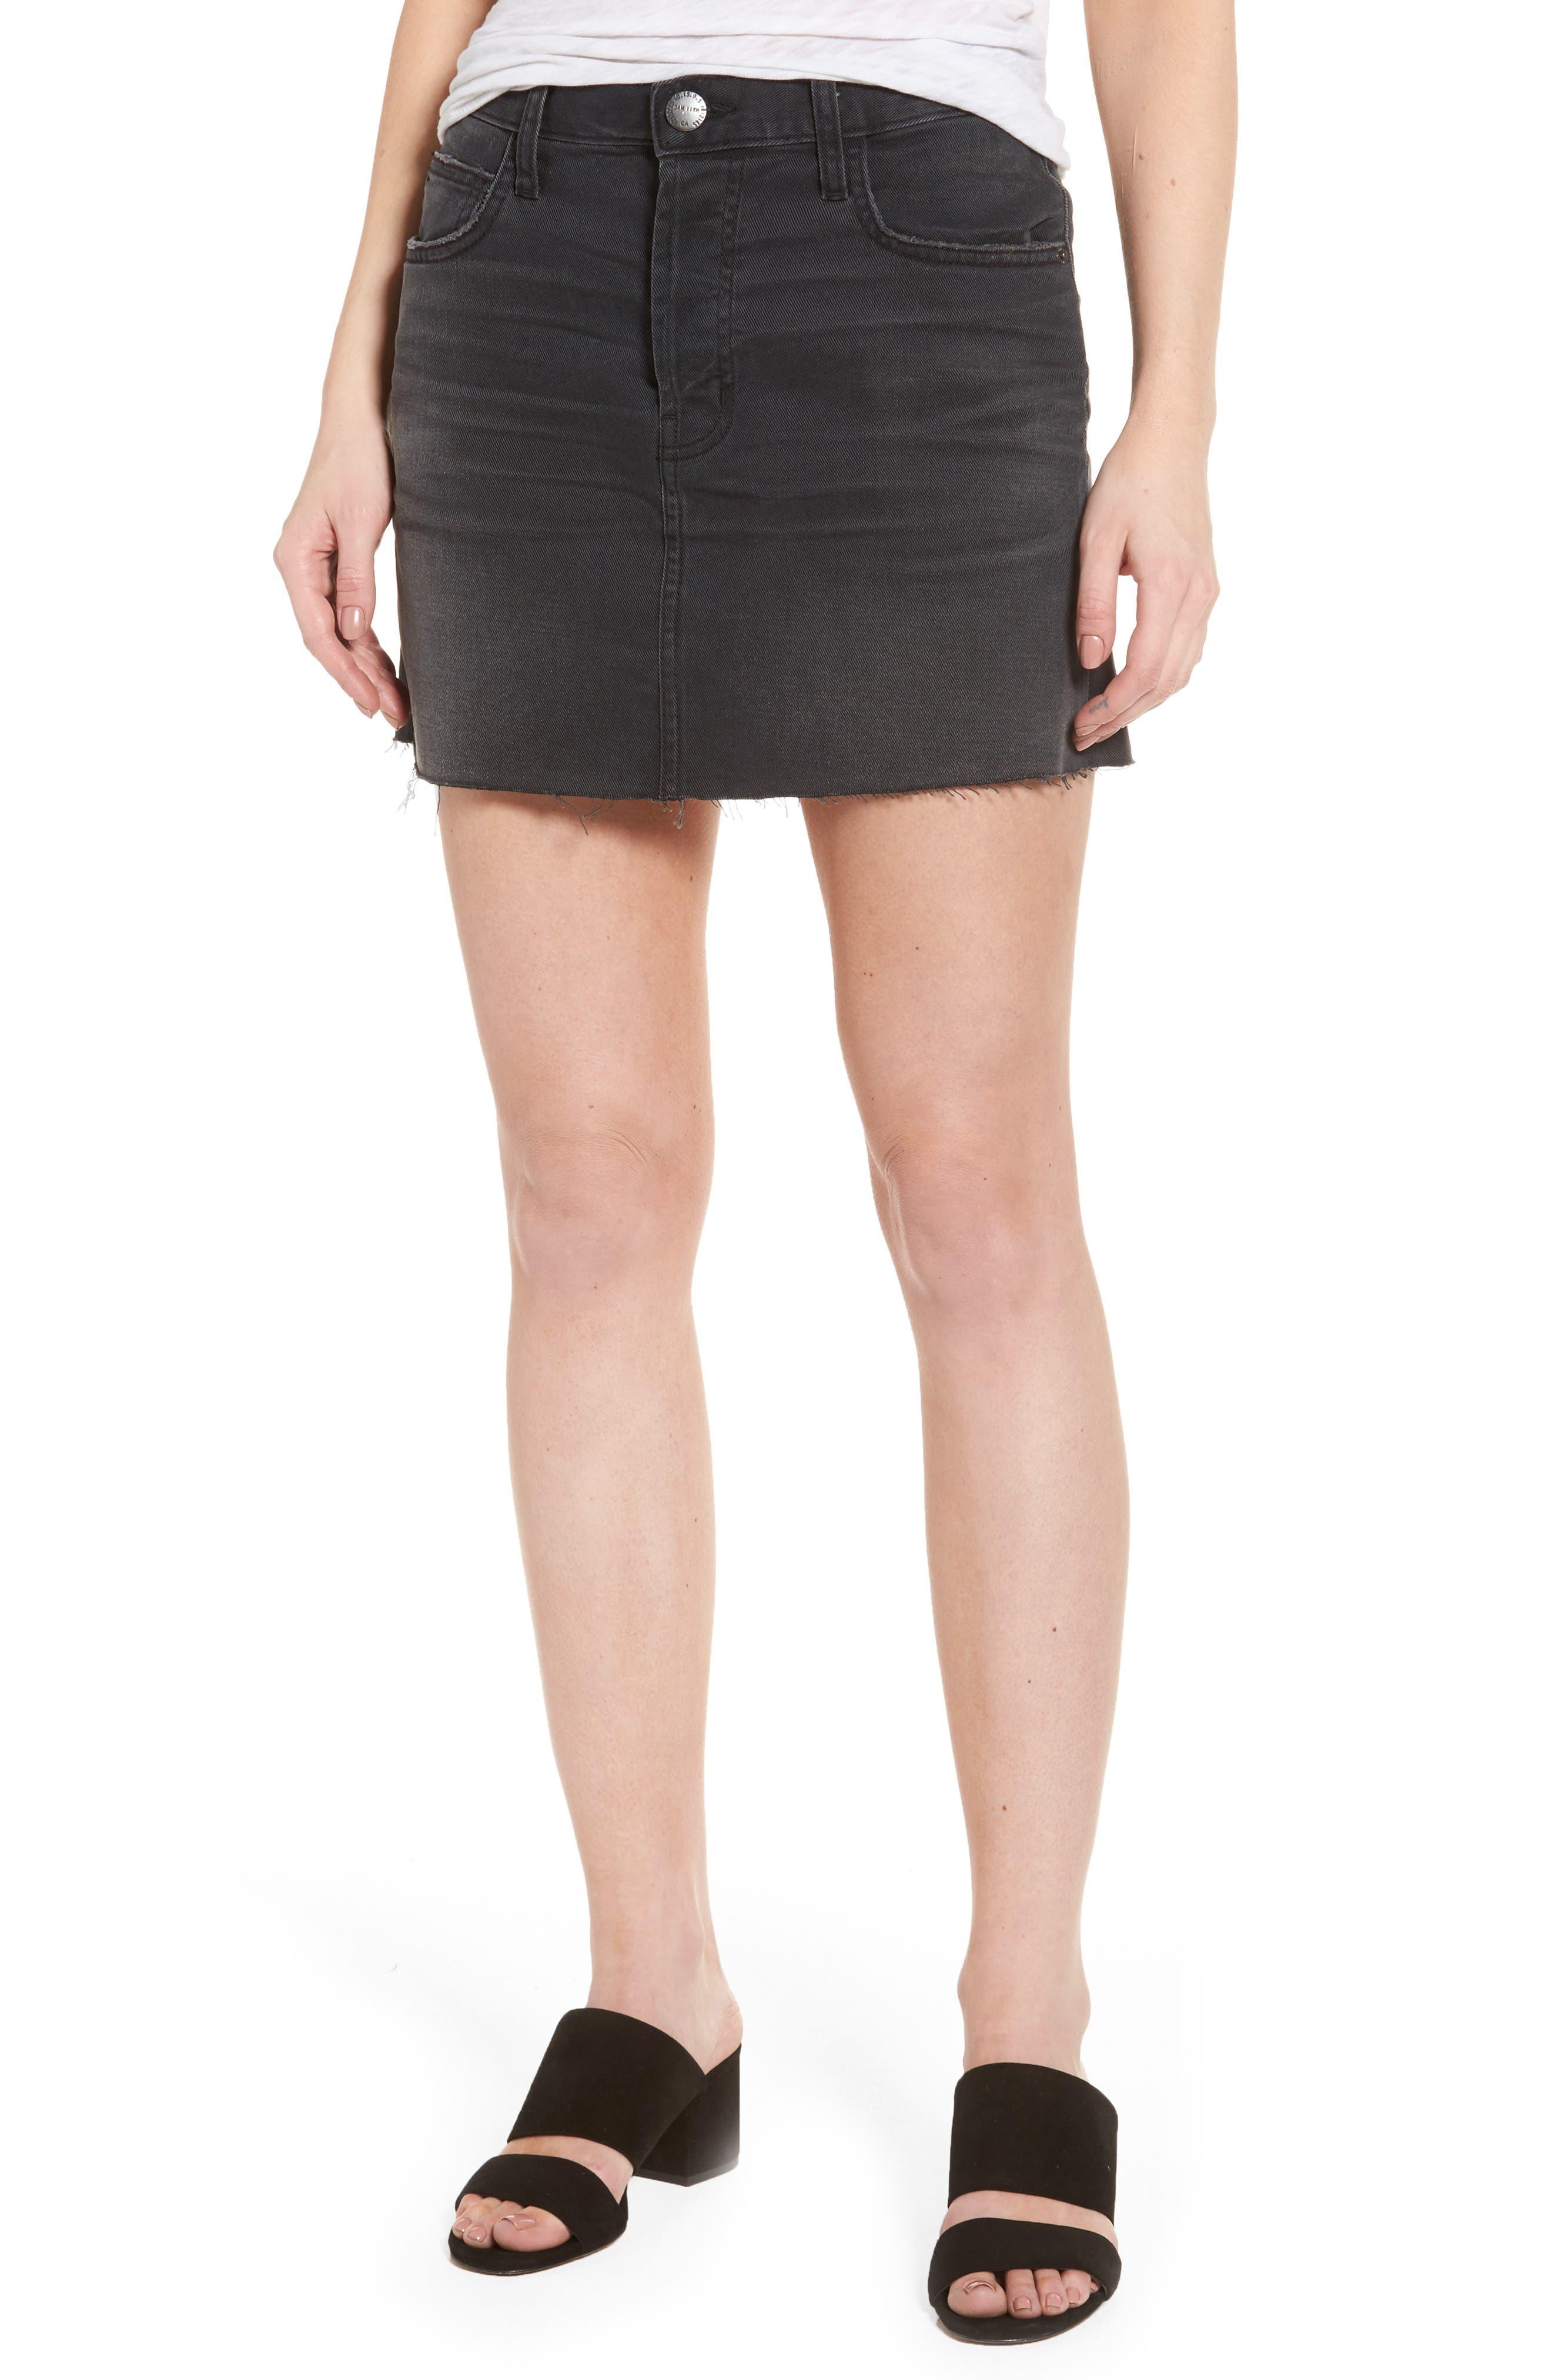 Alternate Image 1 Selected - Current/Elliott Cut Off Miniskirt